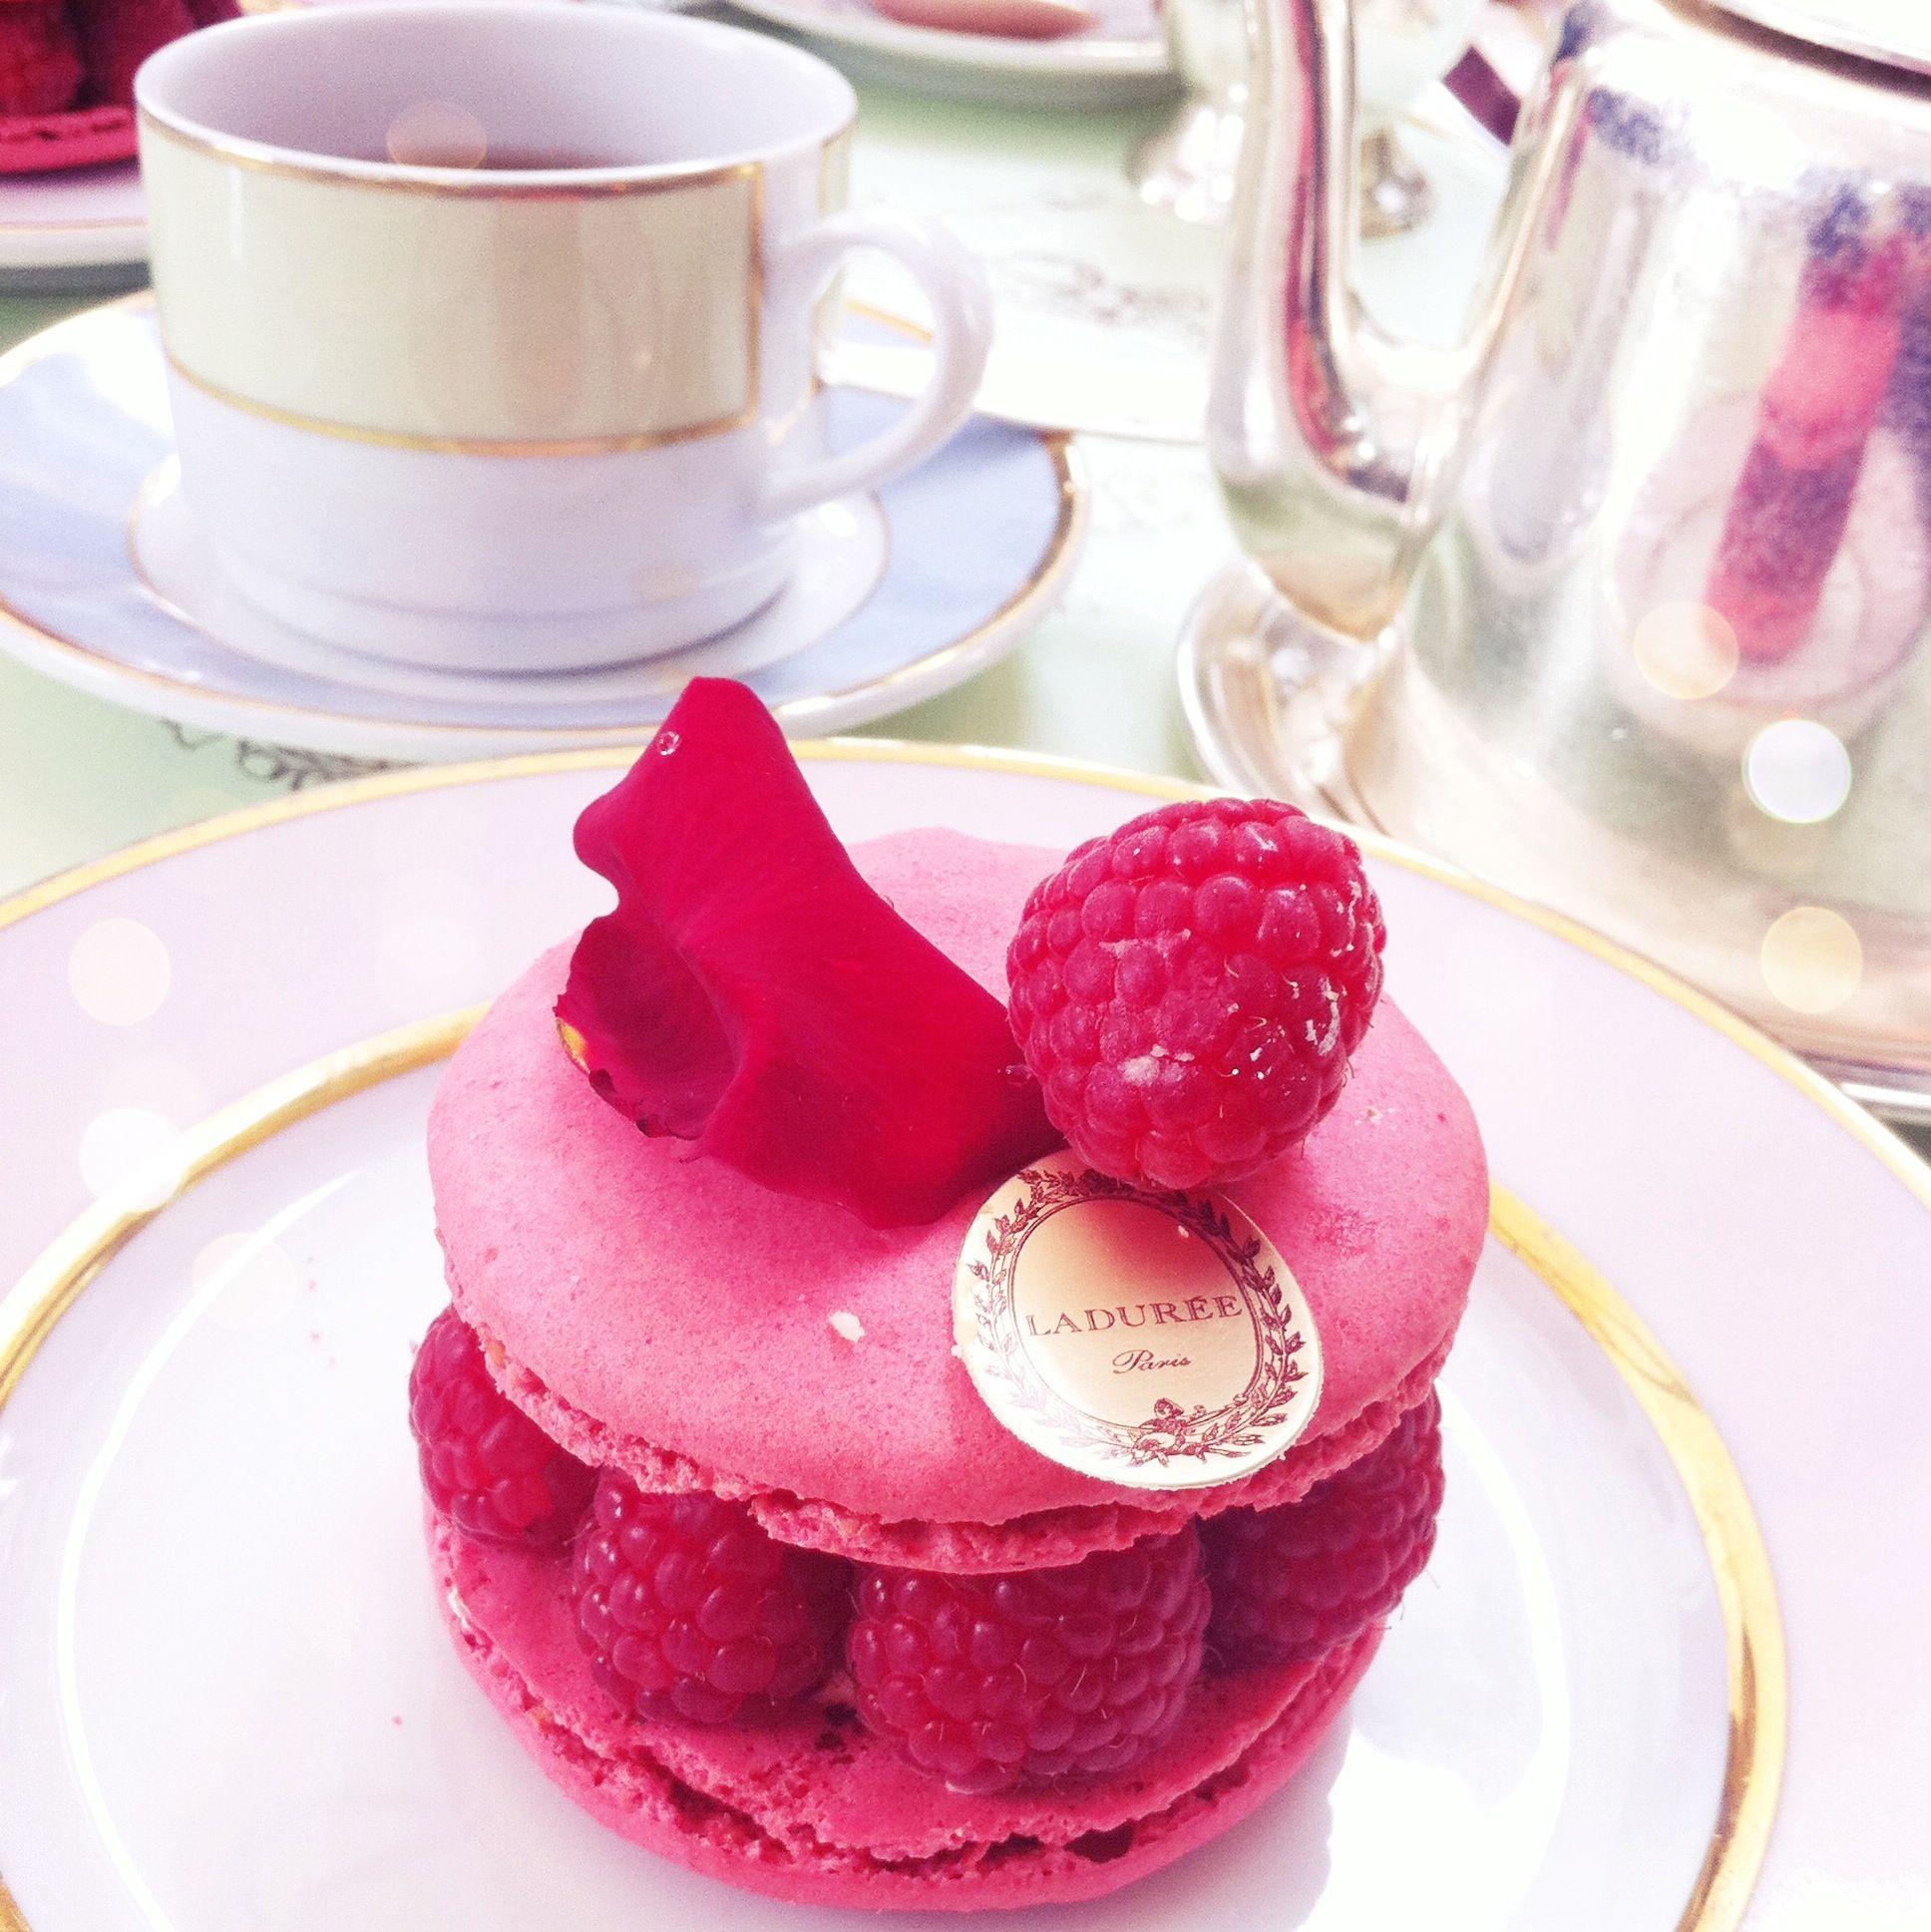 Laduree desserts! I had this cake this week at Harrods!:)